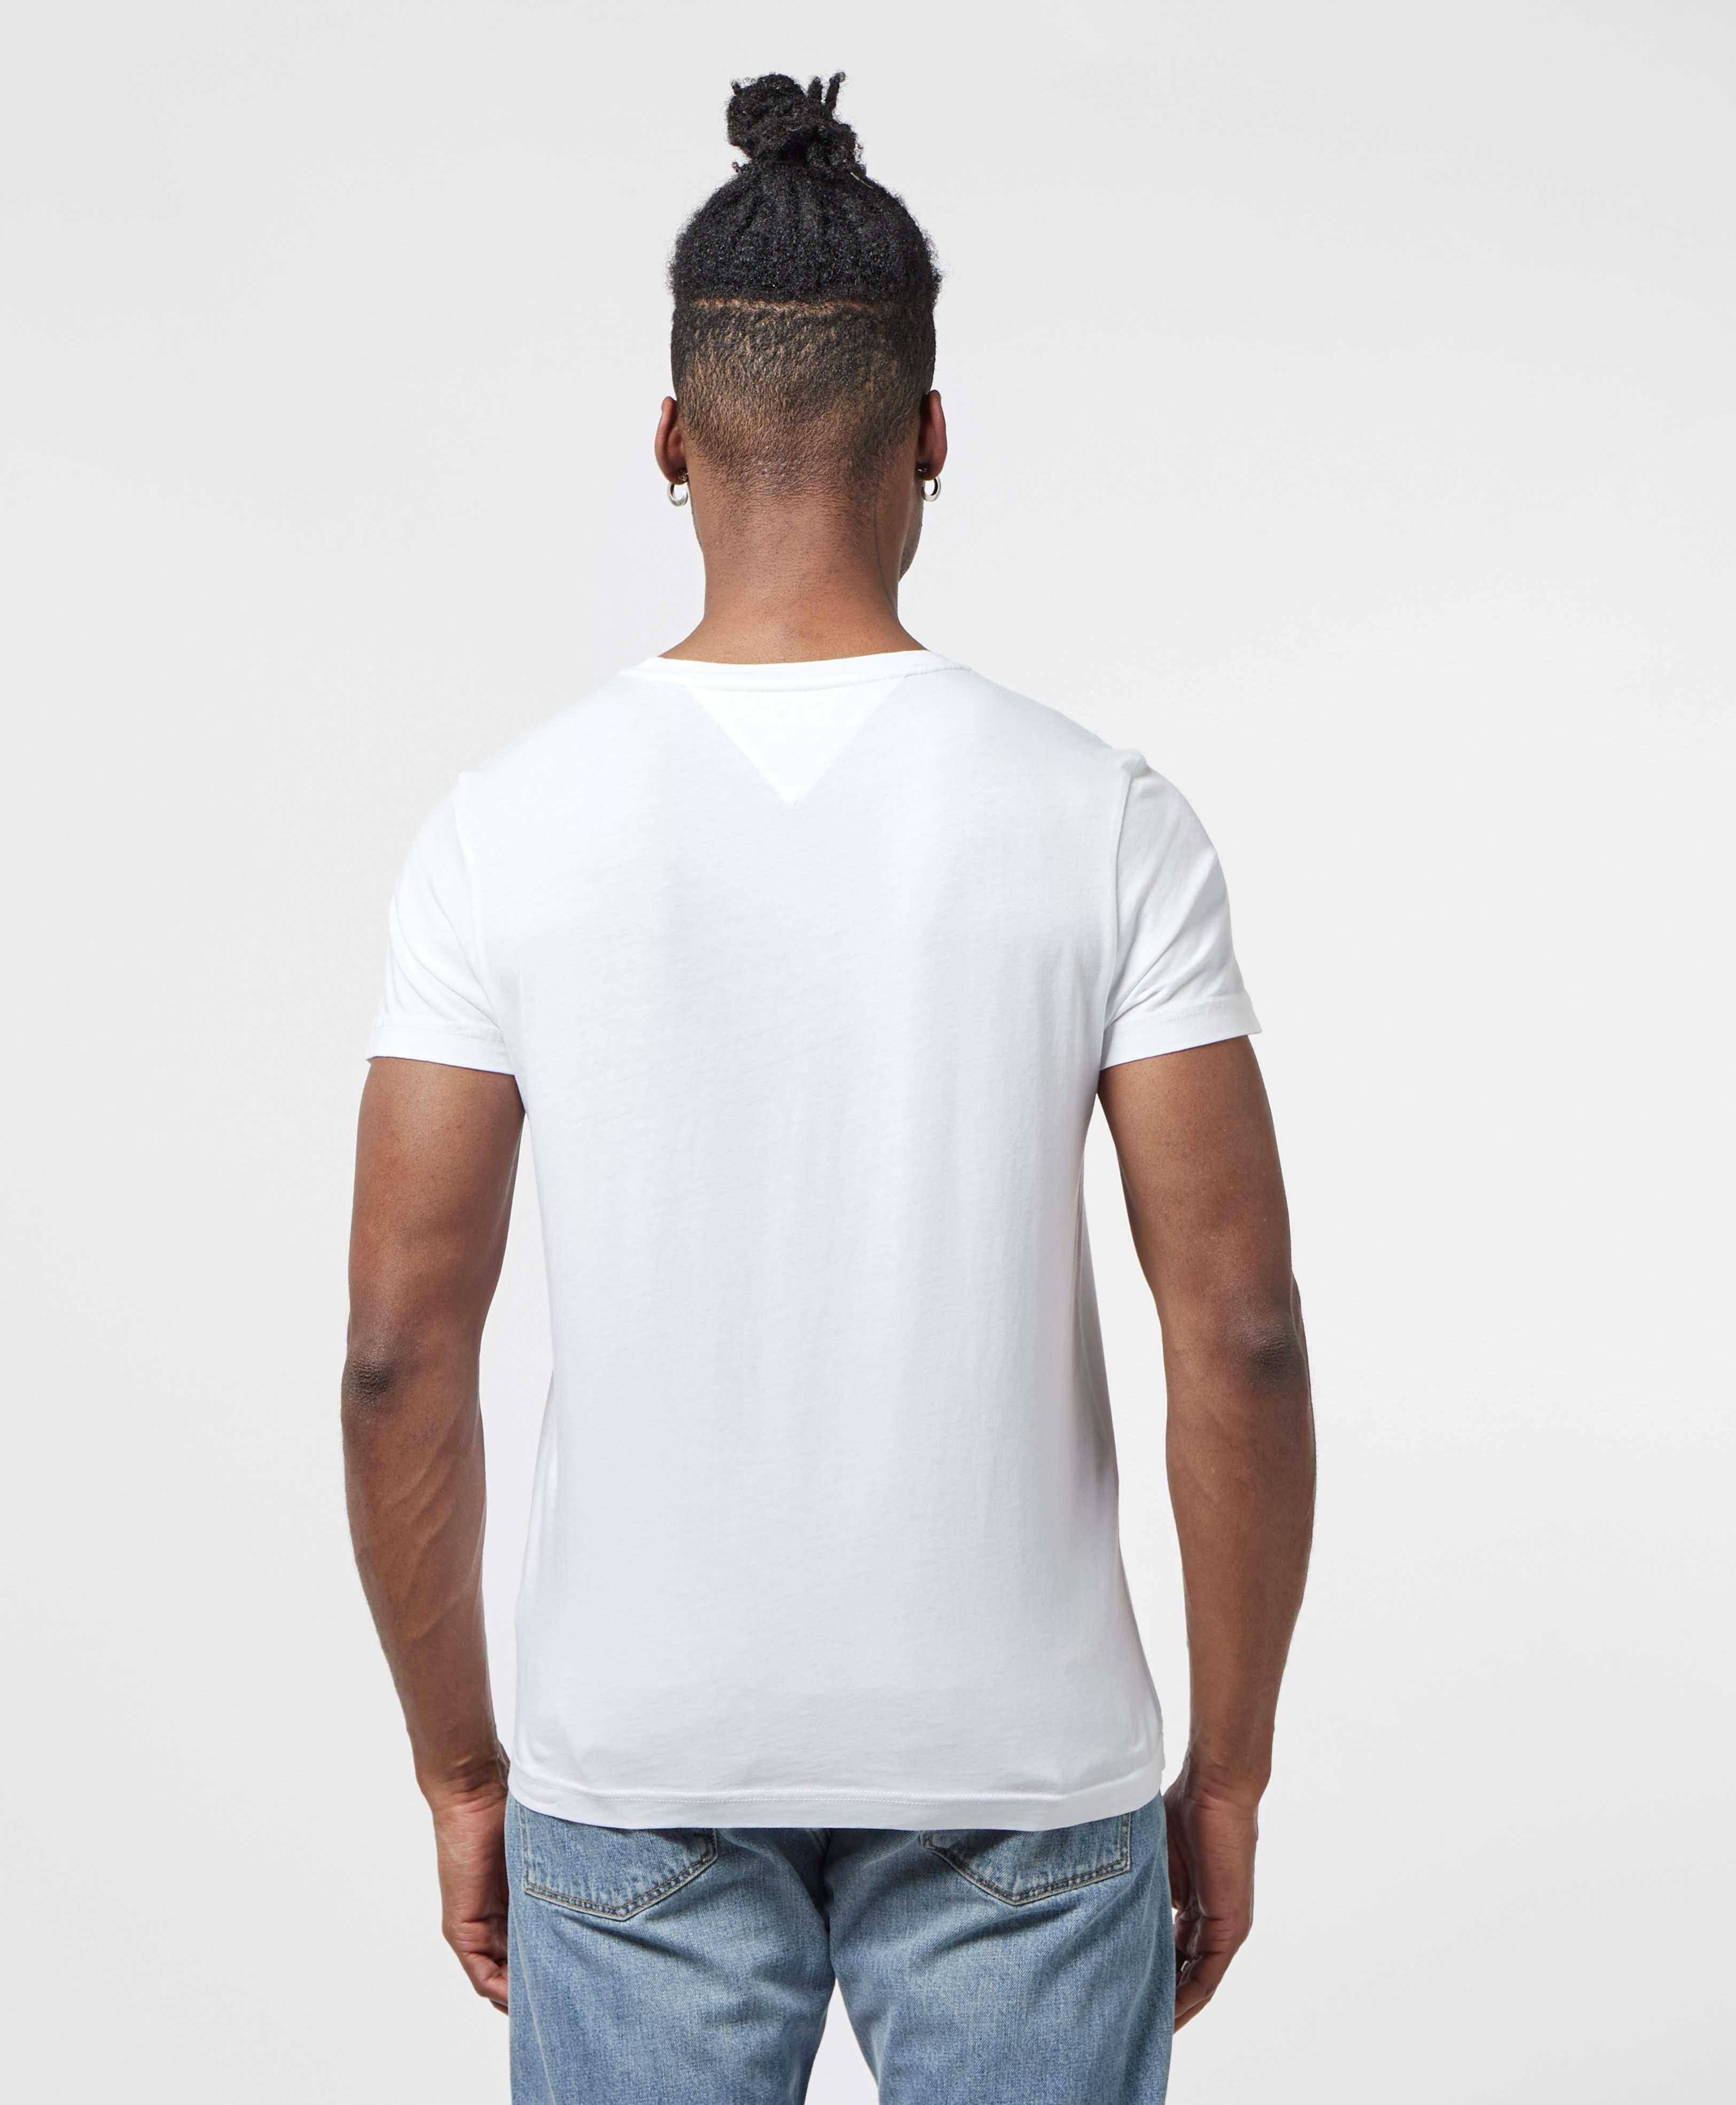 Tommy Hilfiger Box Logo Short Sleeve T-Shirt